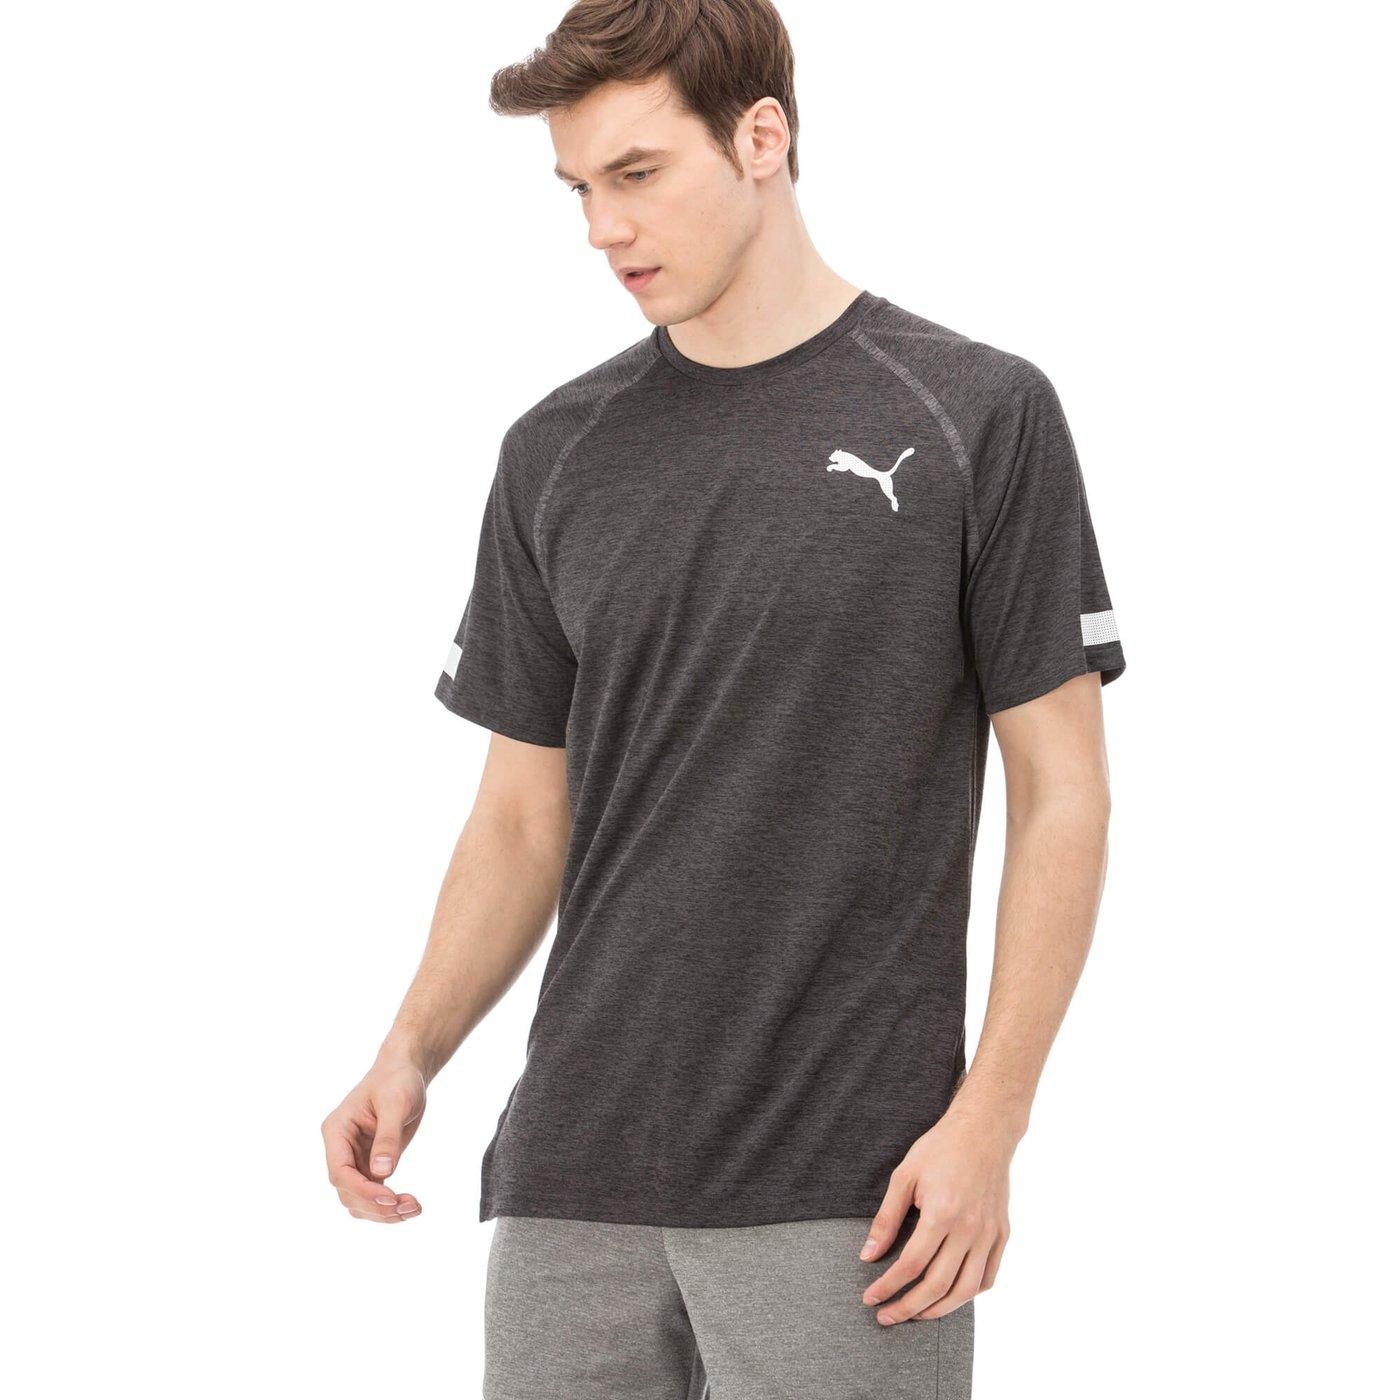 Puma BND Tech Erkek Gri Tshirt